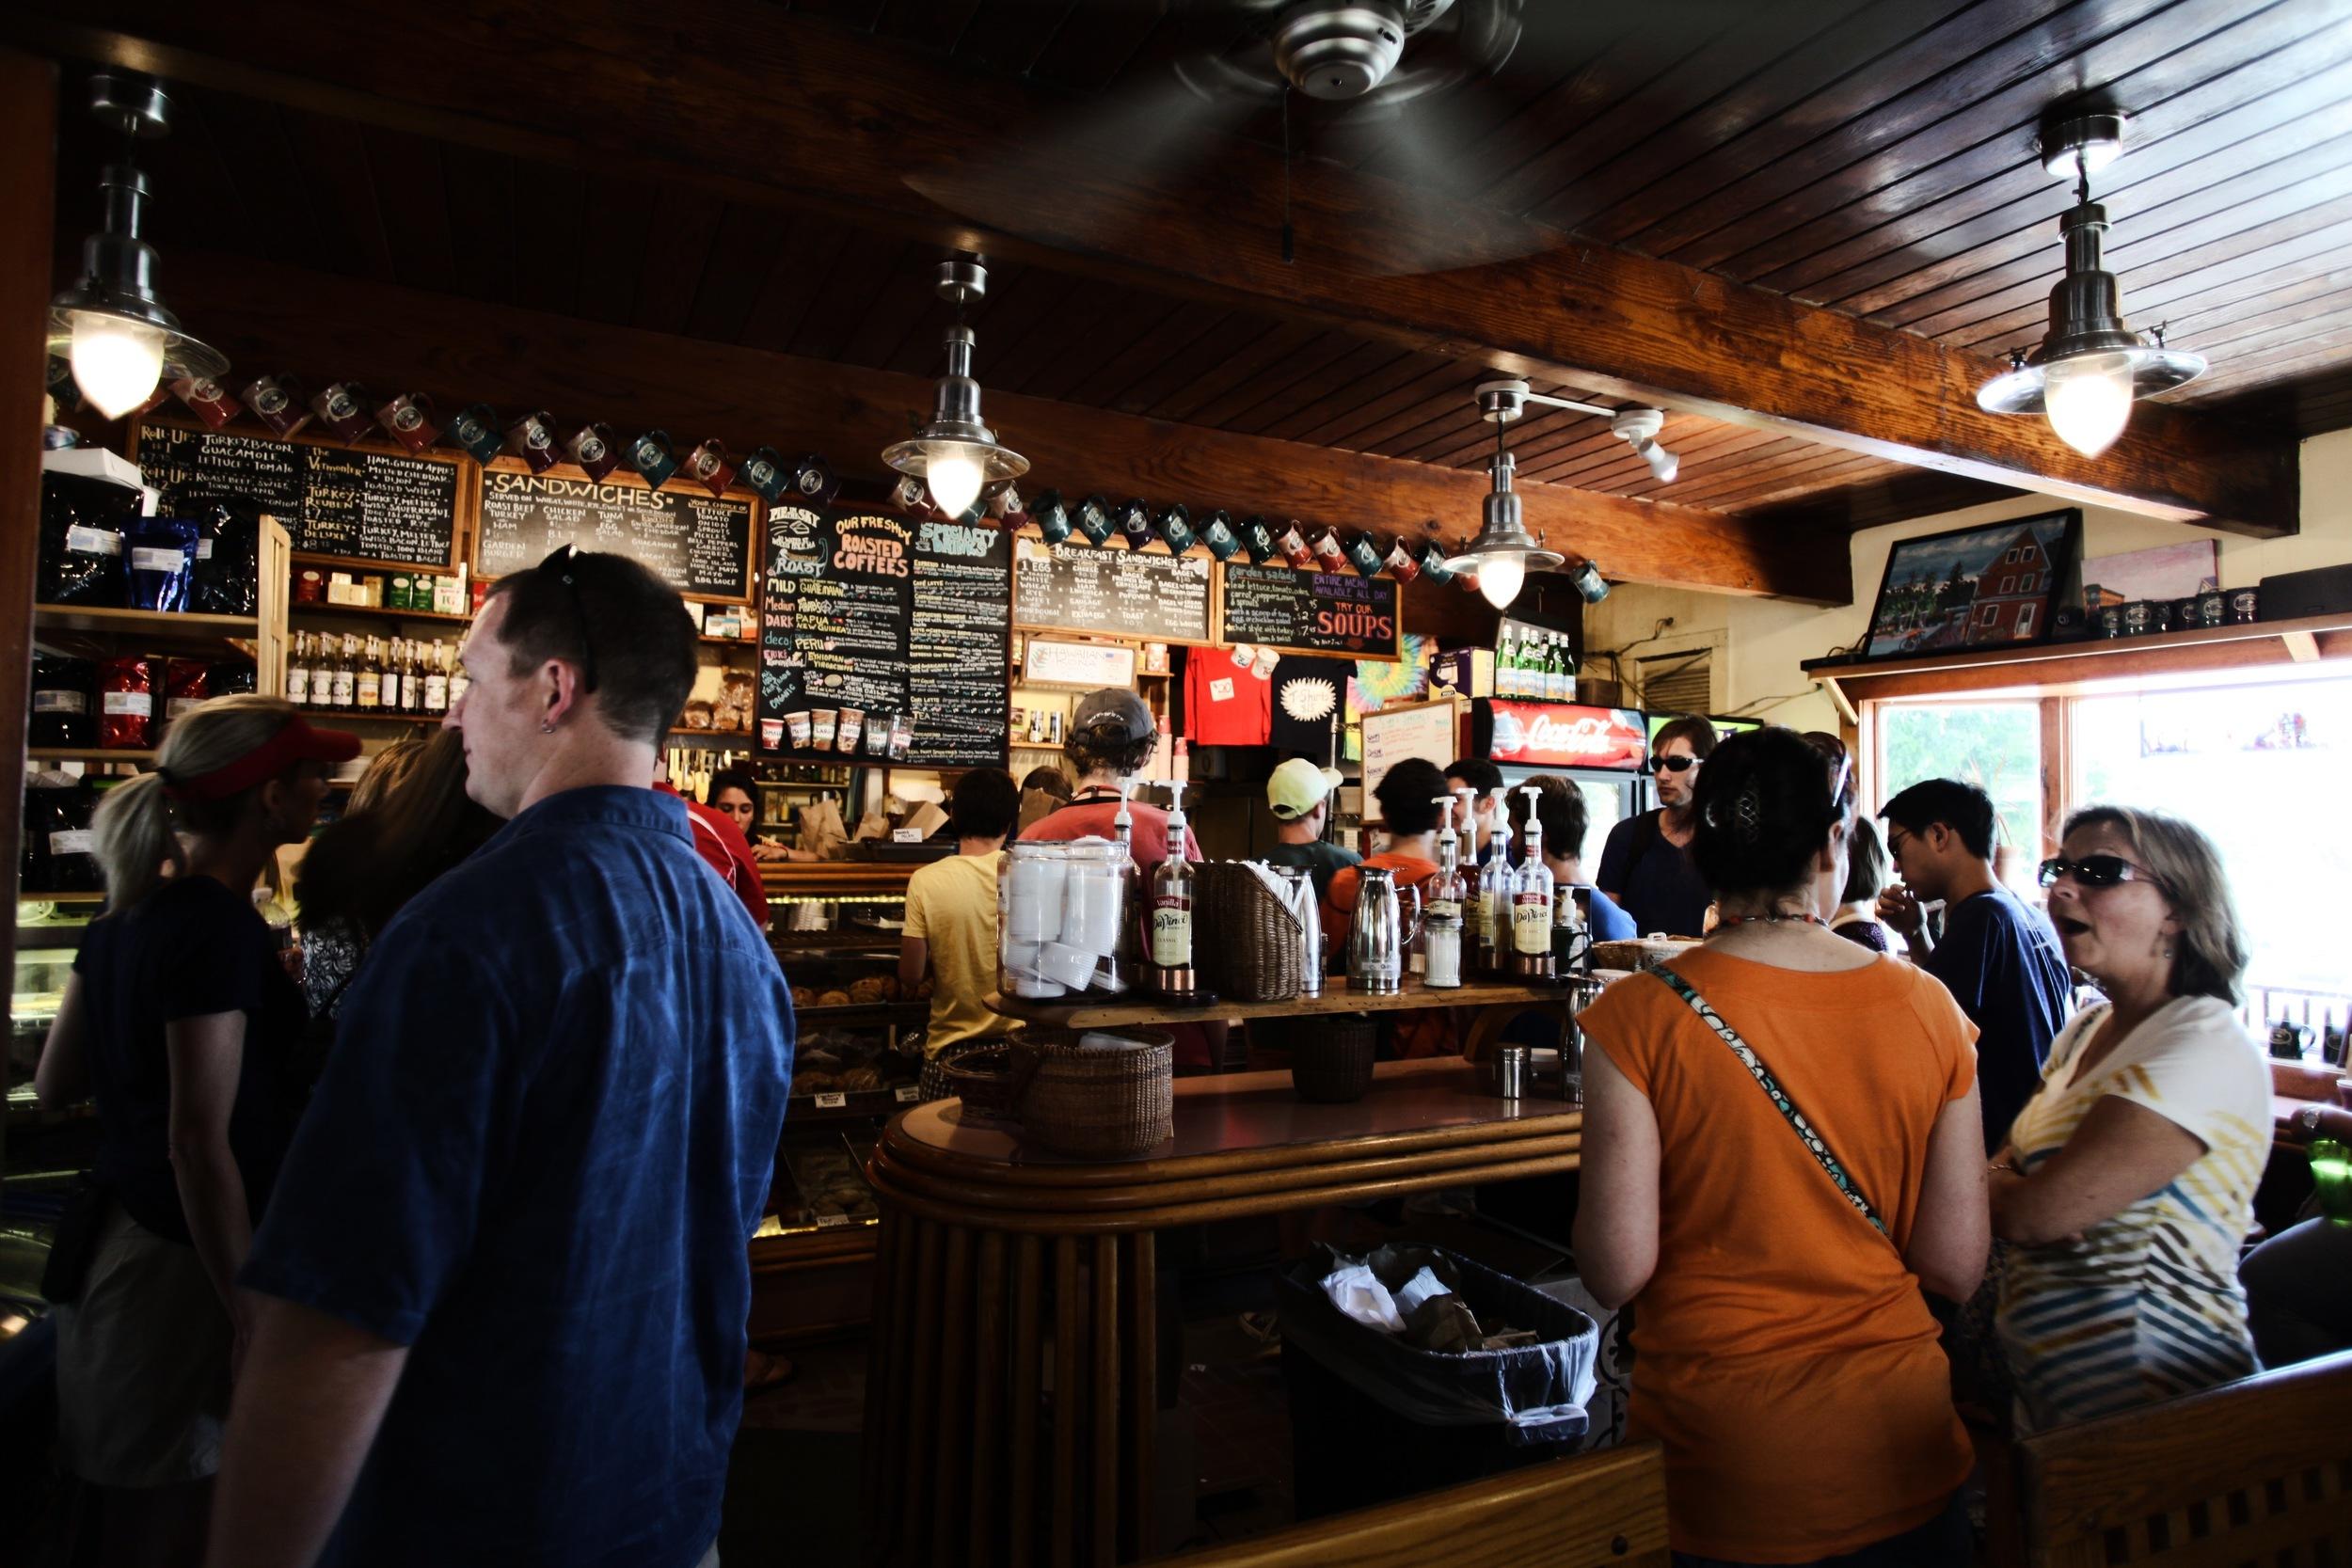 restaurant-people-alcohol-bar.jpg